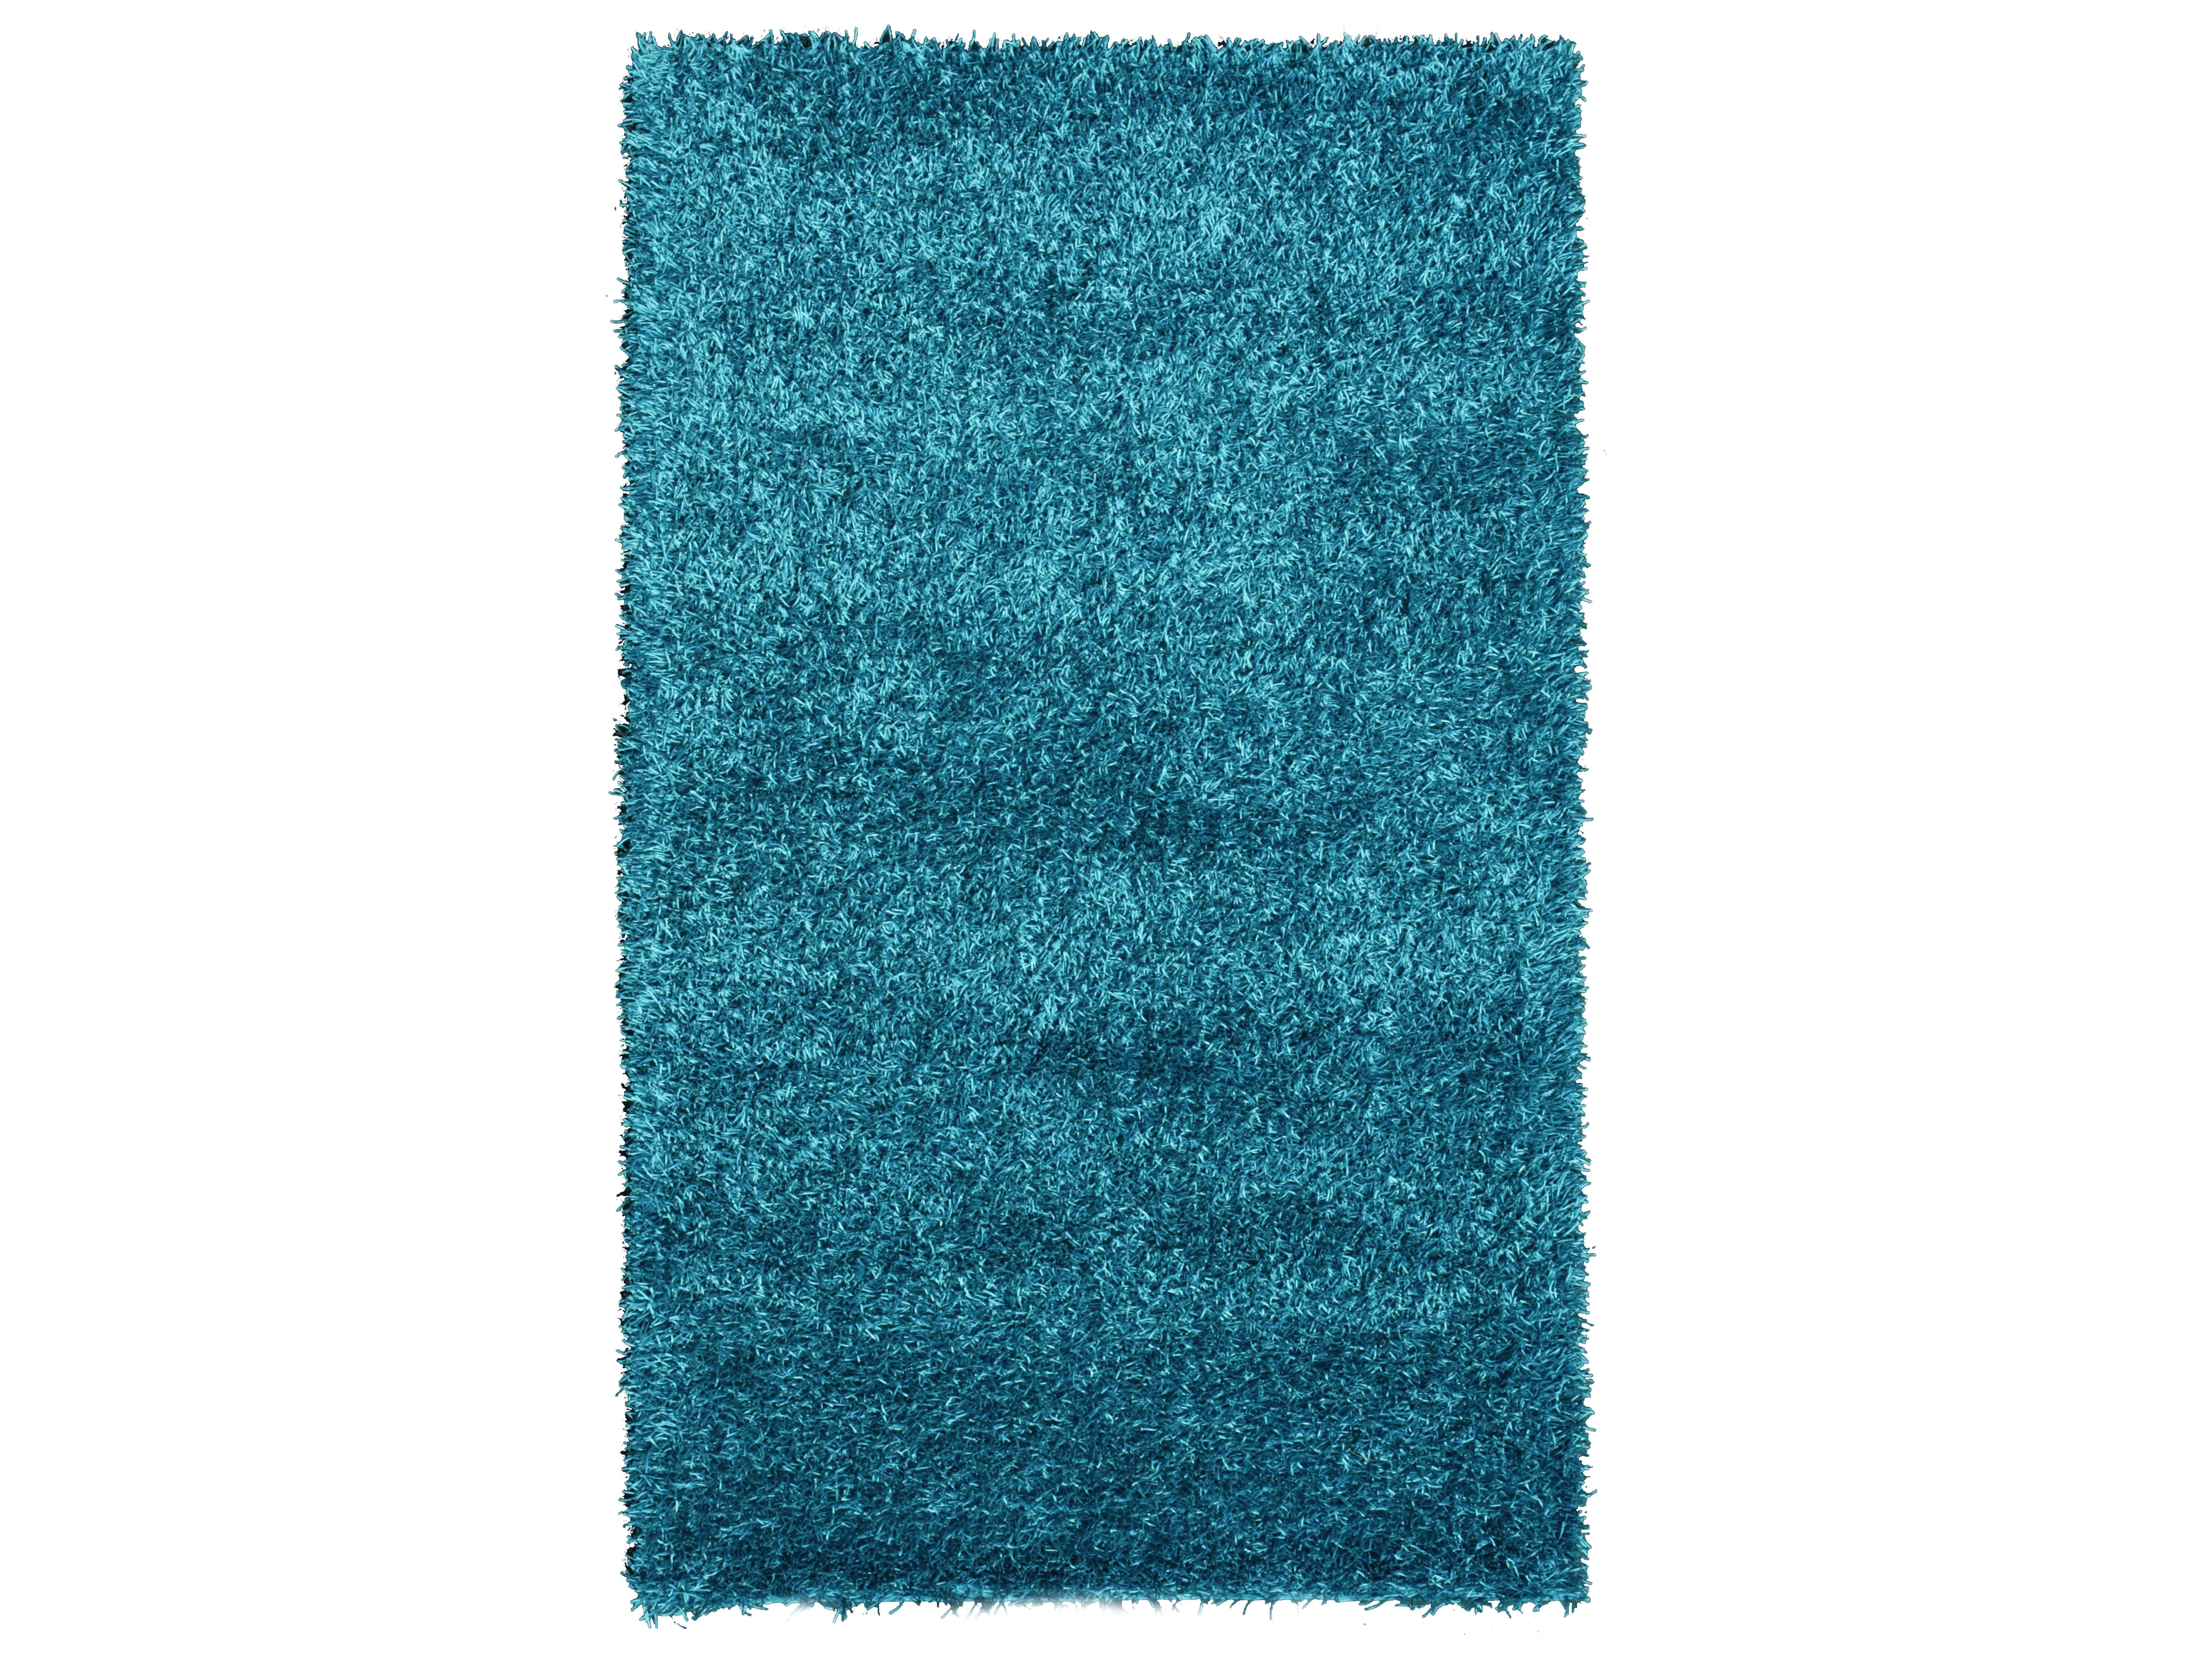 noble house sara rectangular turquoise area rug sara2214